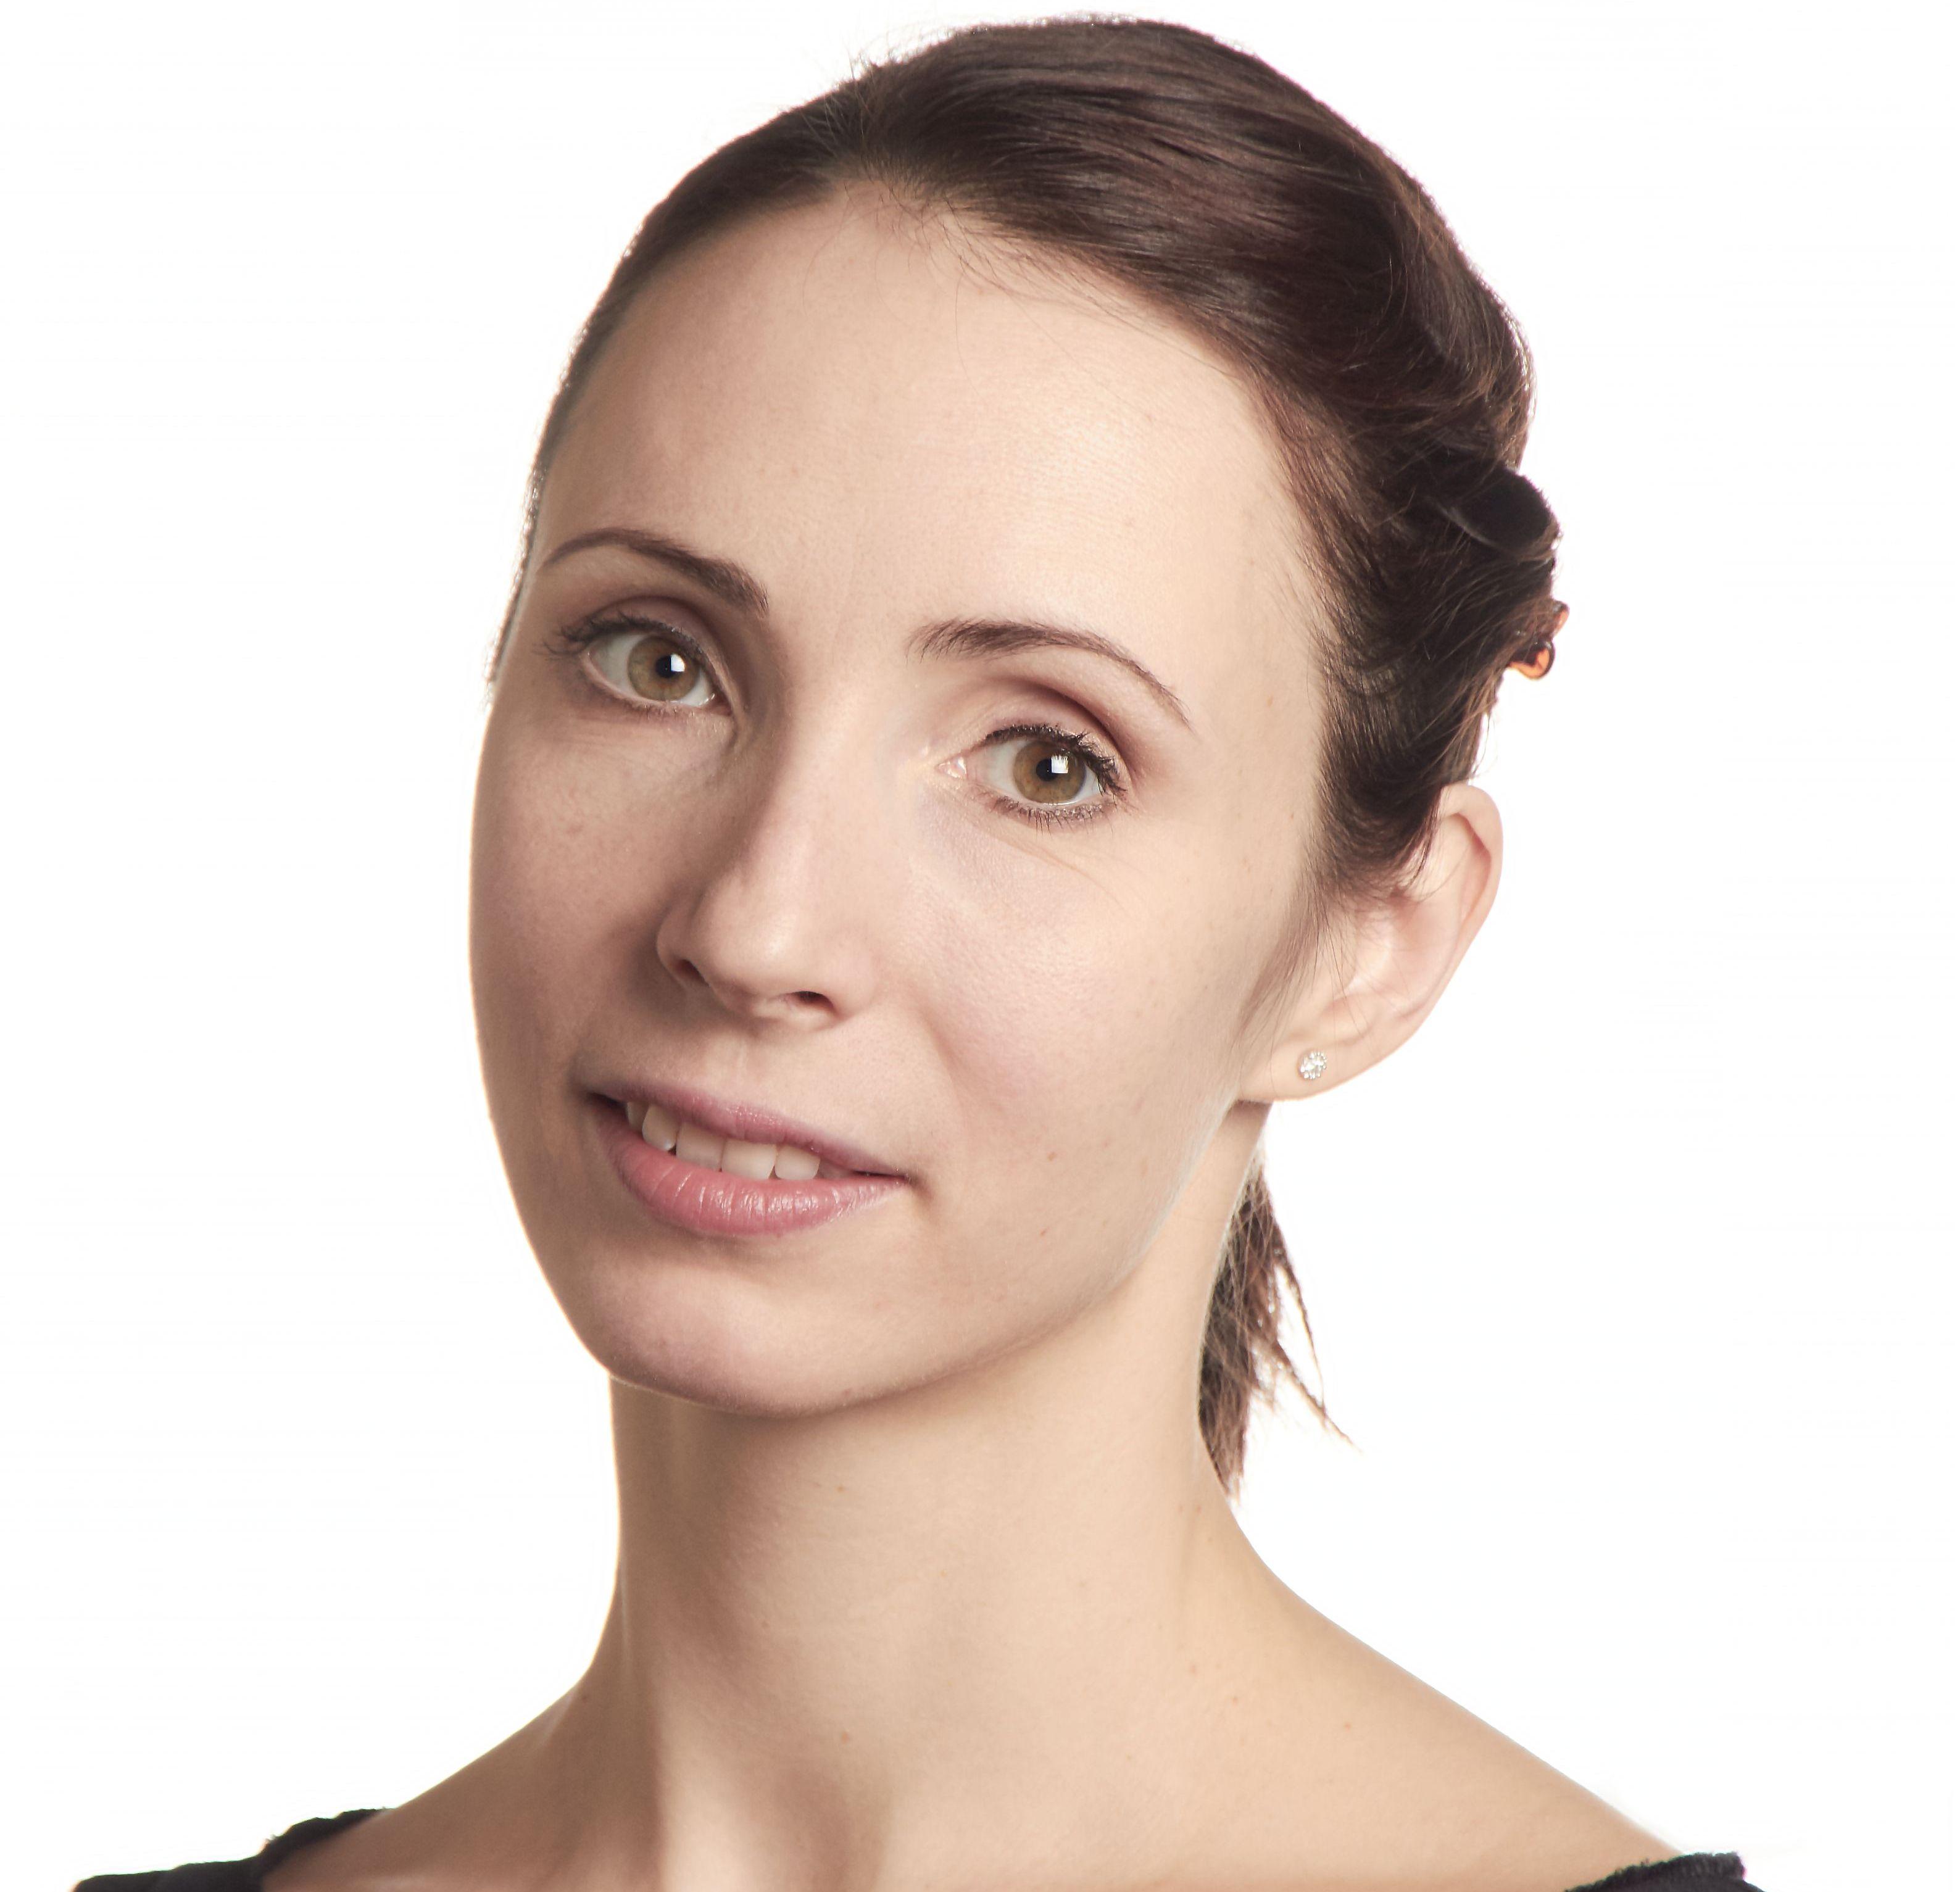 DariaSukhorukova